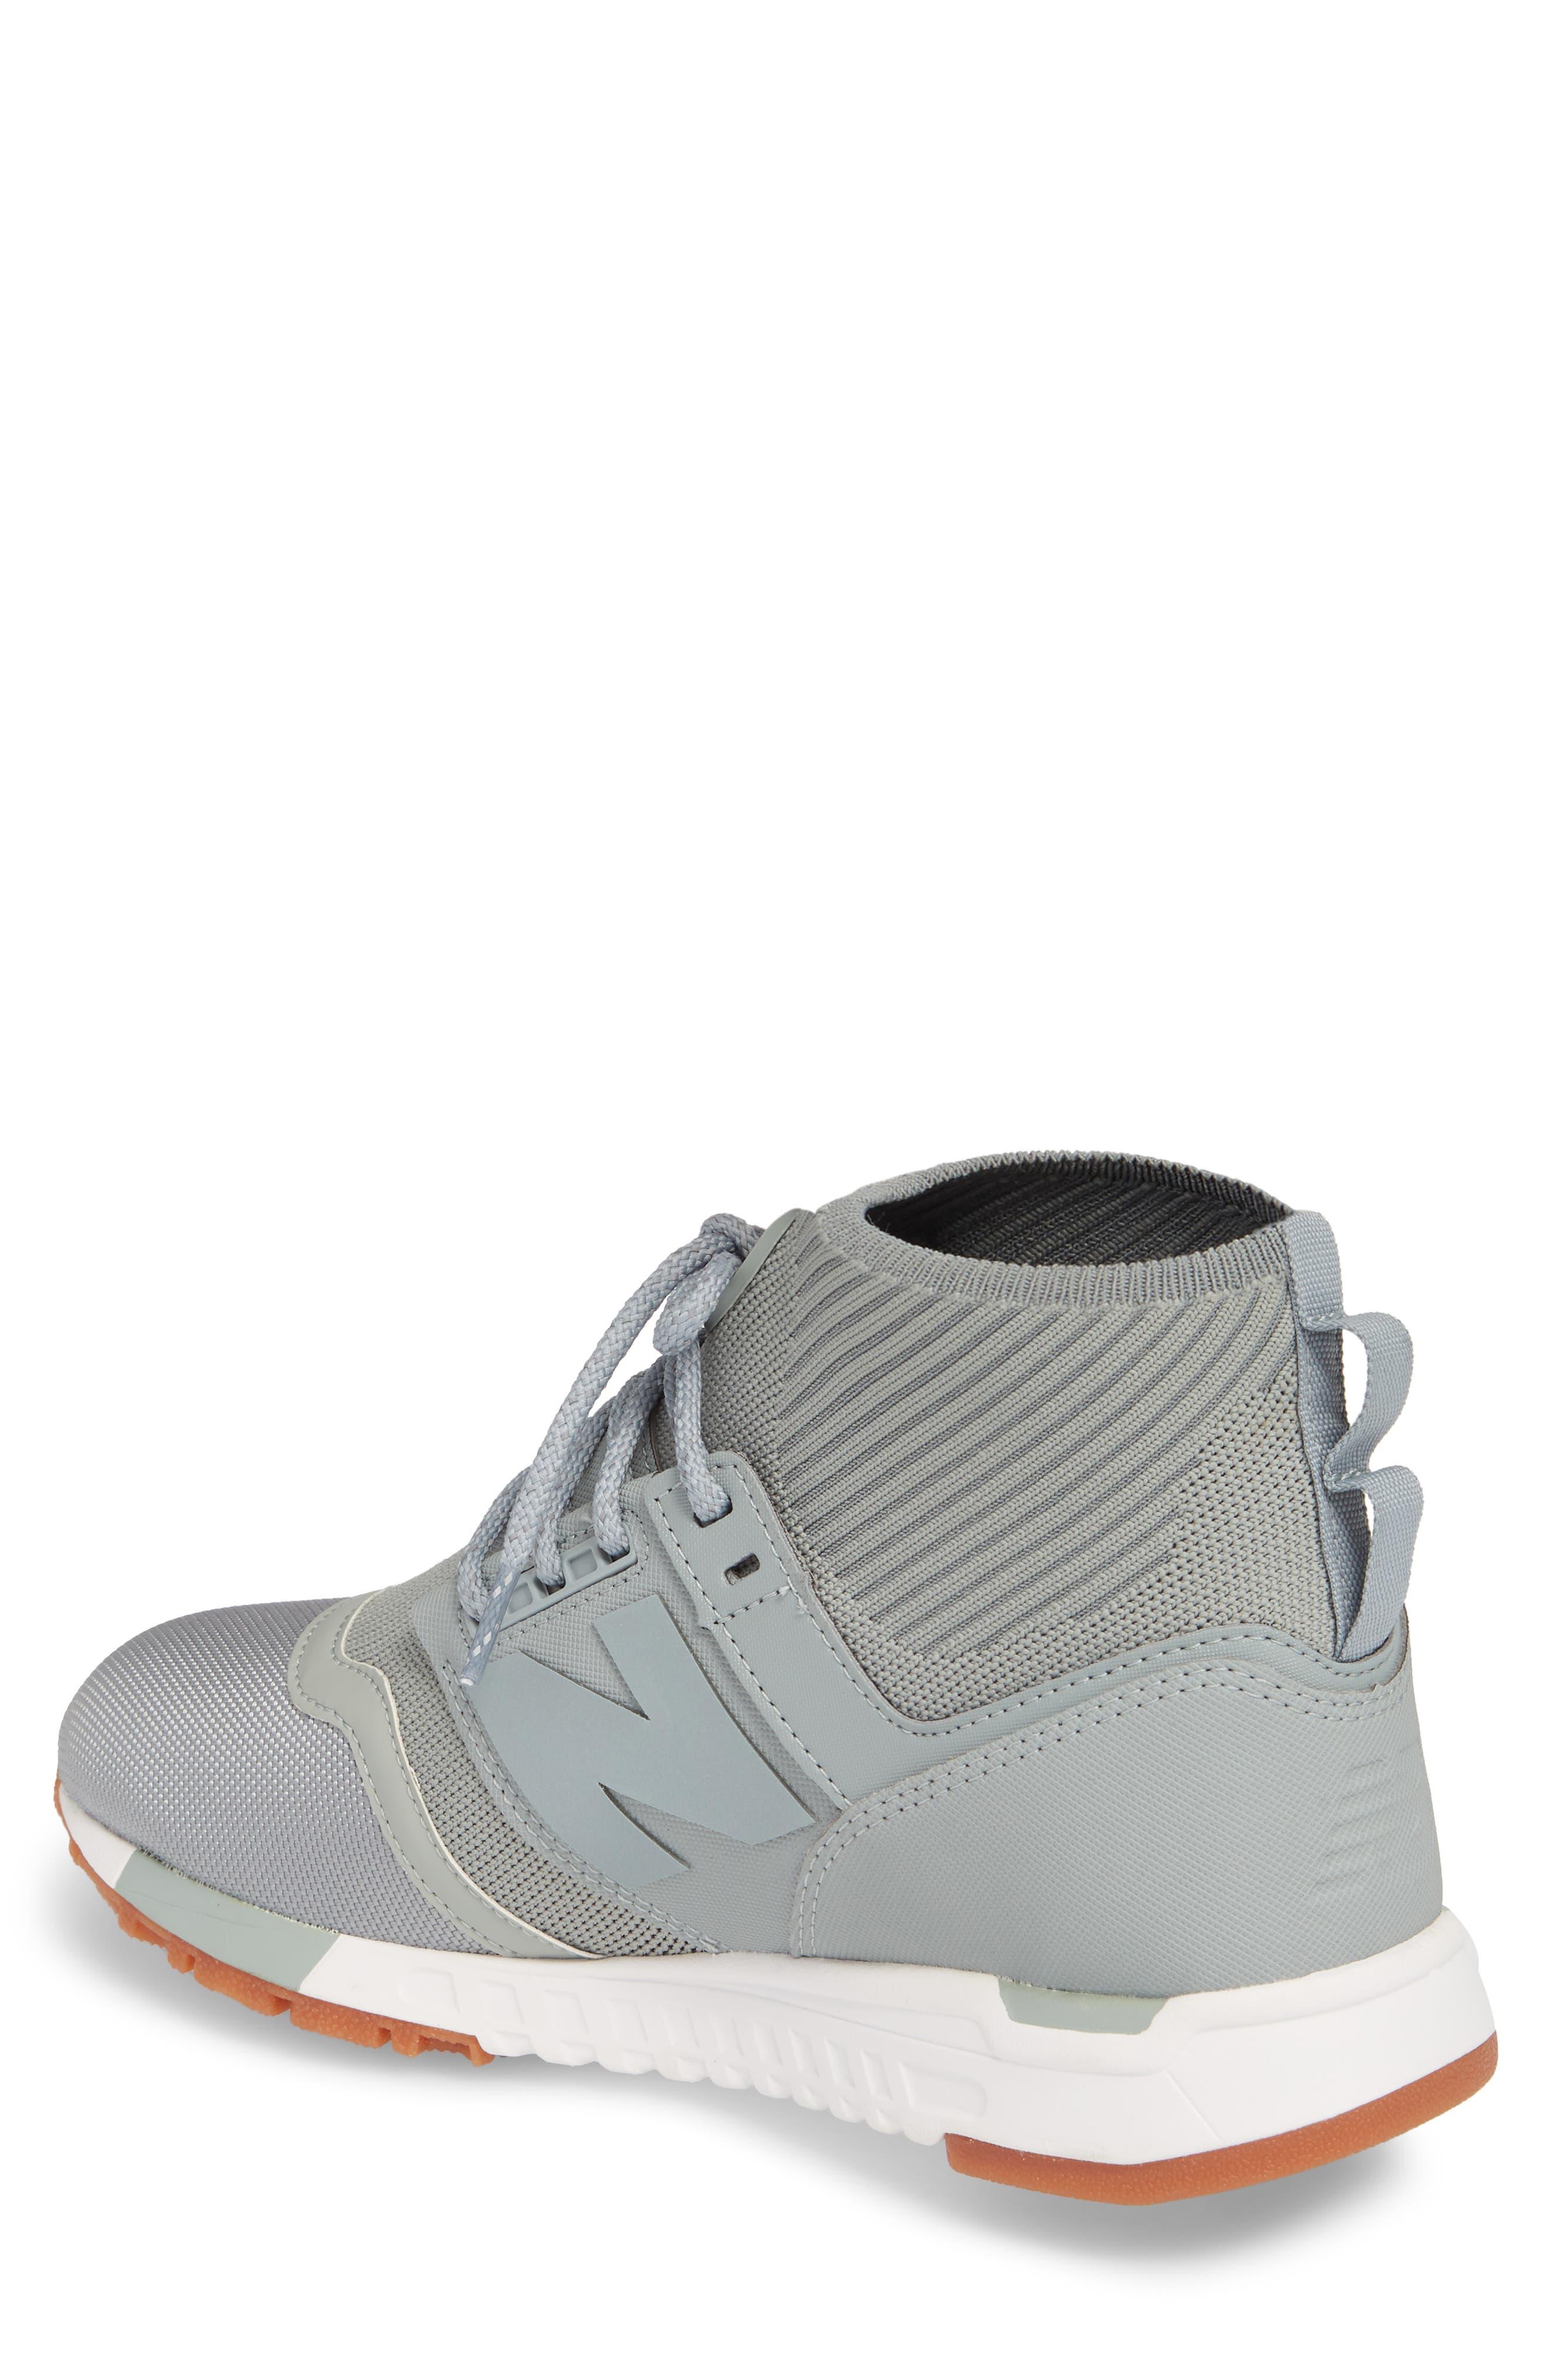 247 Mid Sneaker,                             Alternate thumbnail 6, color,